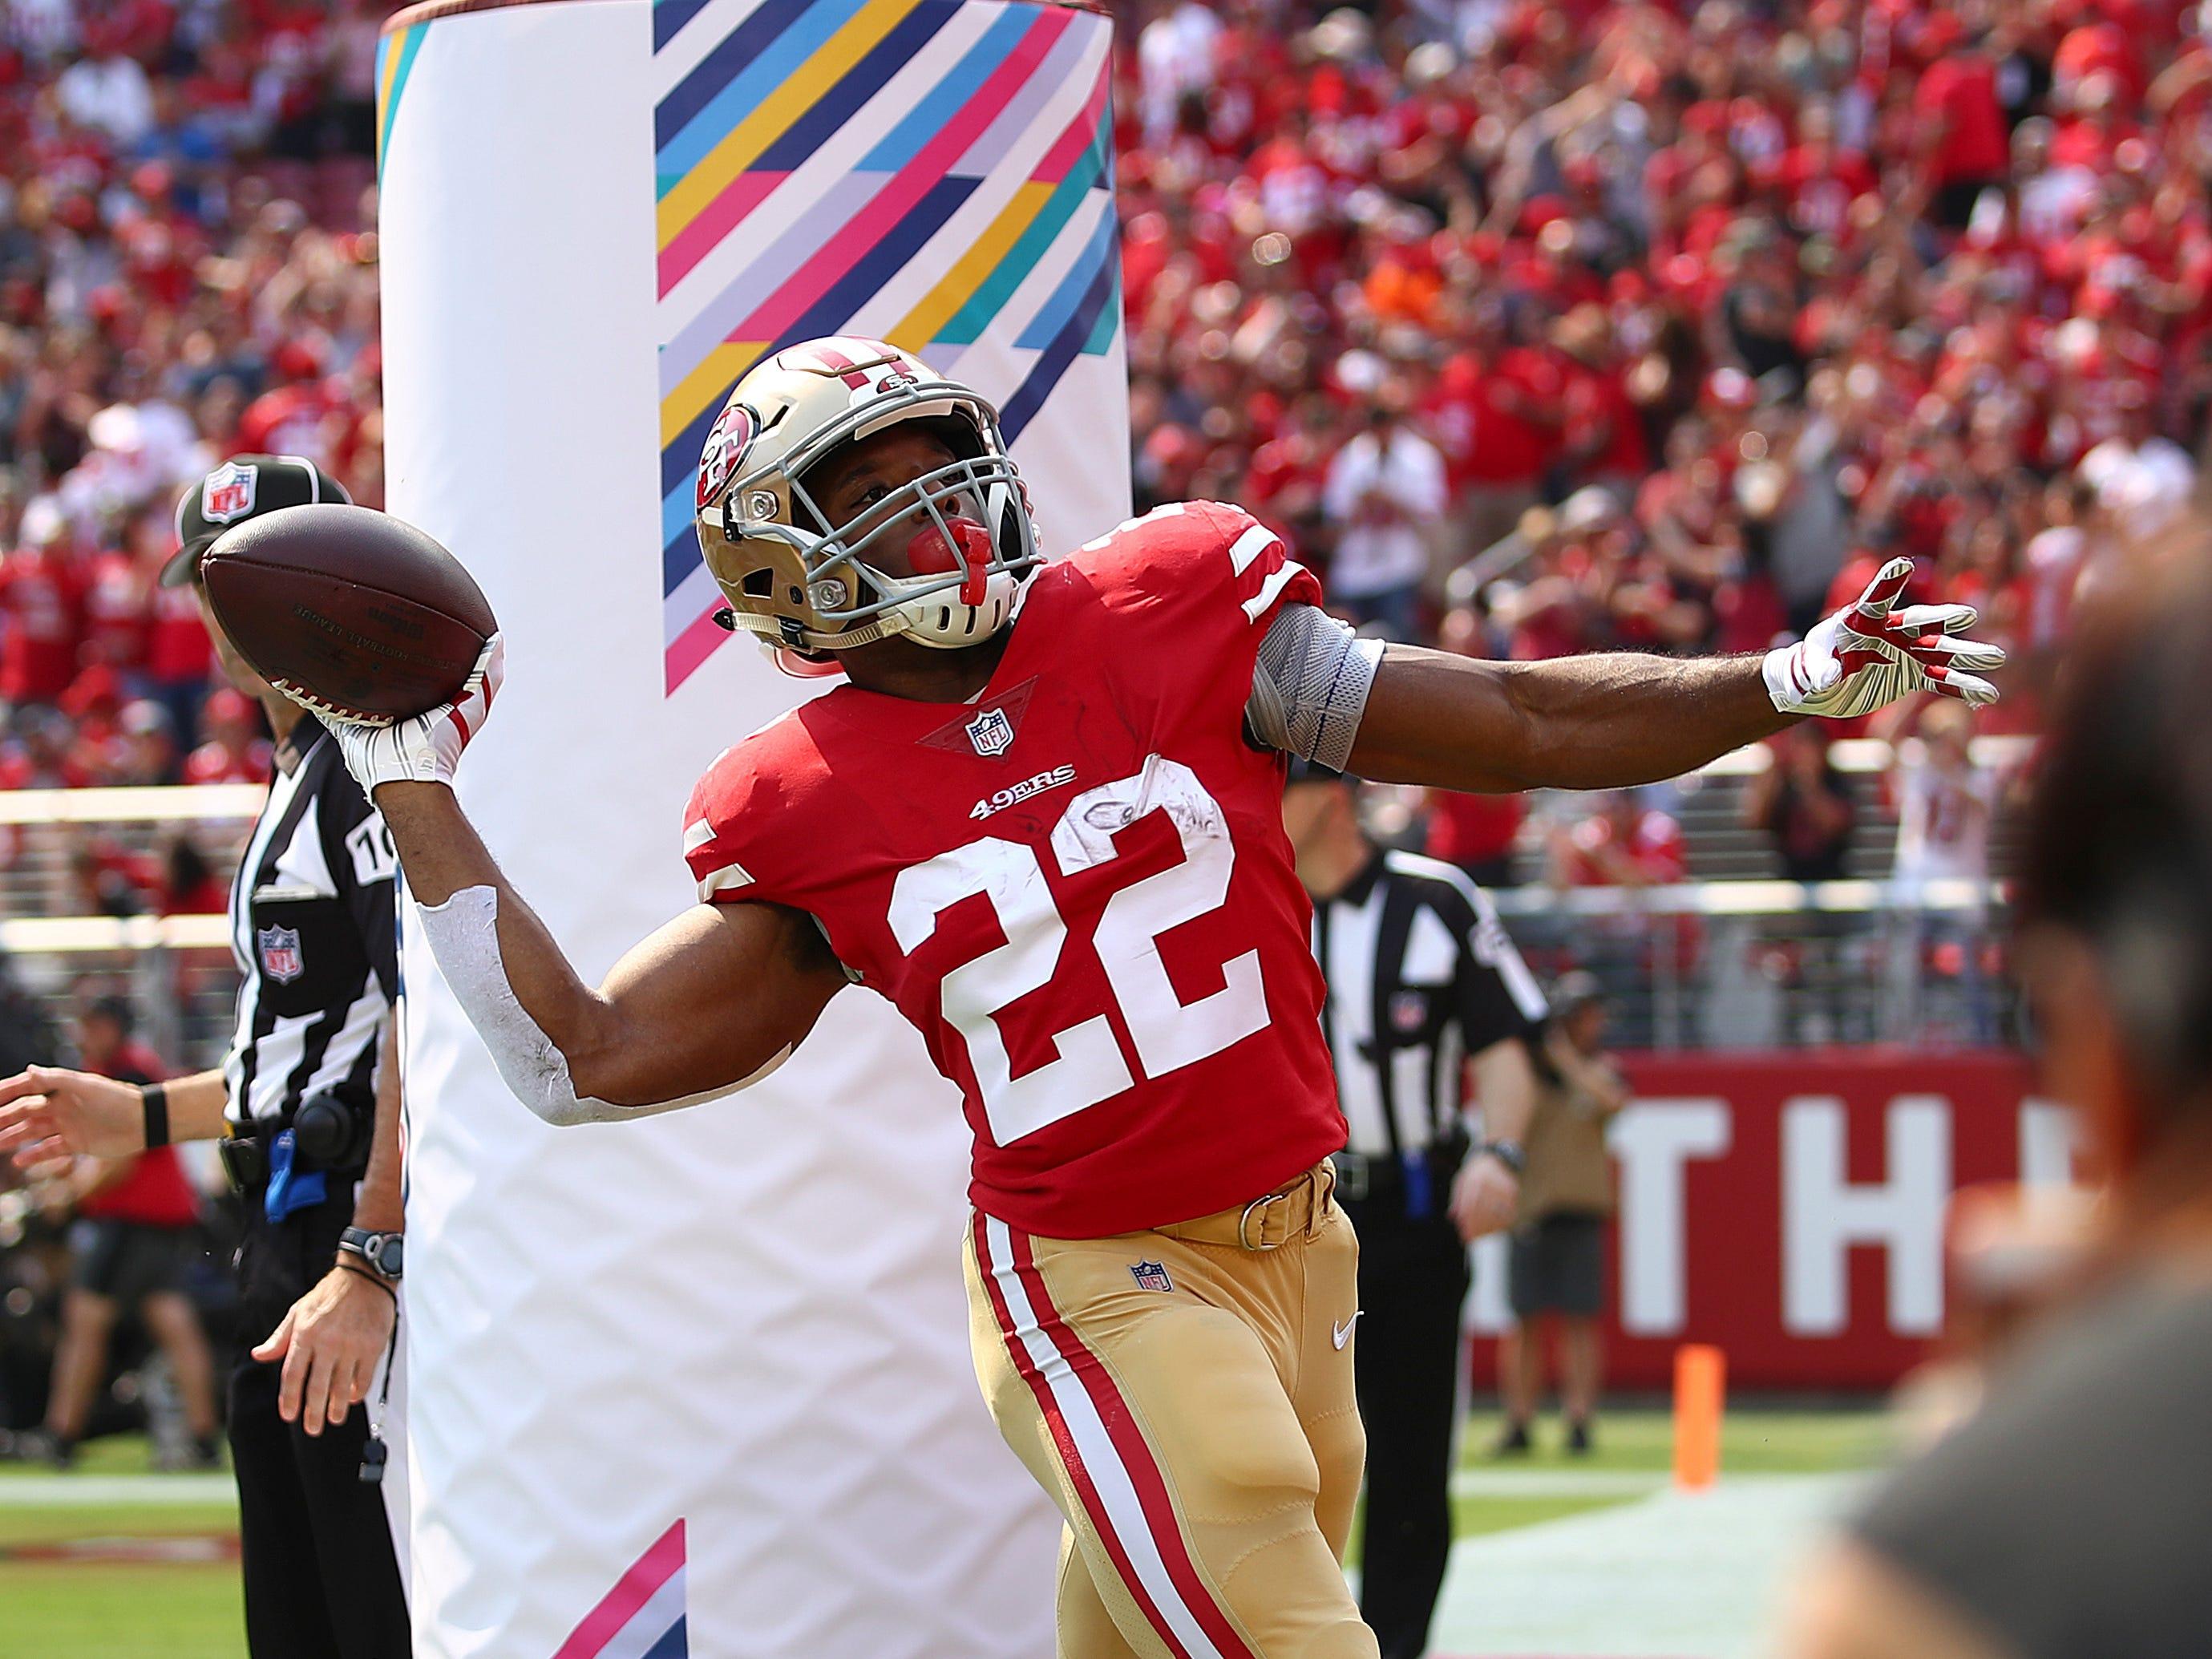 San Francisco 49ers running back Matt Breida (22) celebrates after scoring a touchdown against the Arizona Cardinals during the first half of an NFL football game in Santa Clara, Calif., Sunday, Oct. 7, 2018.